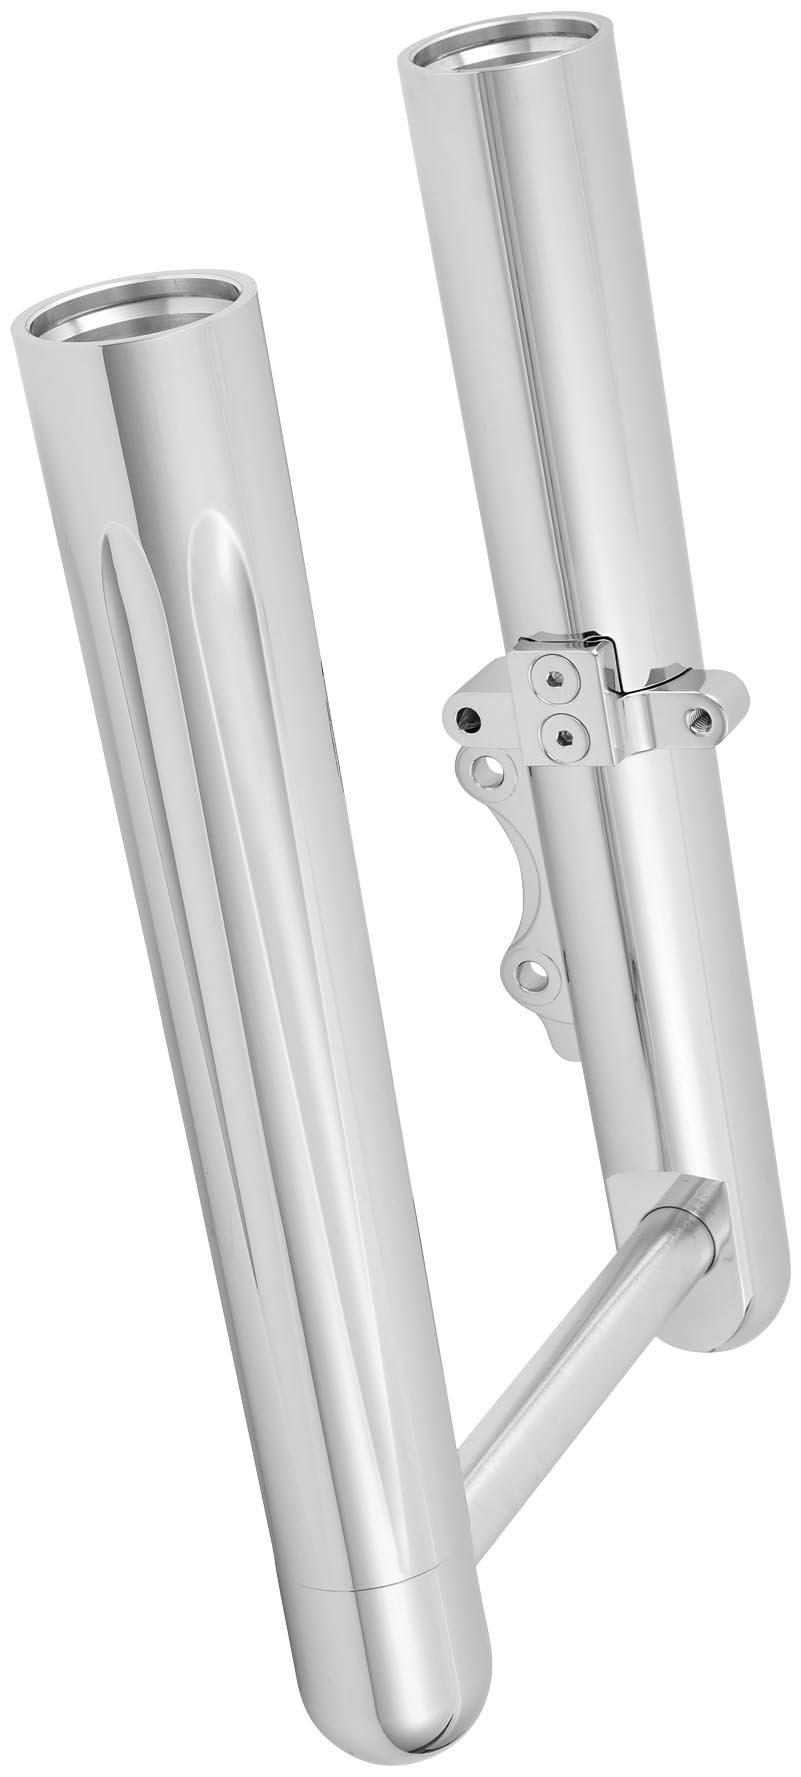 Arlen Ness Deep Cut Hot Legs for Harley Davidson 2000-06 FXST Single Disc model - One Size